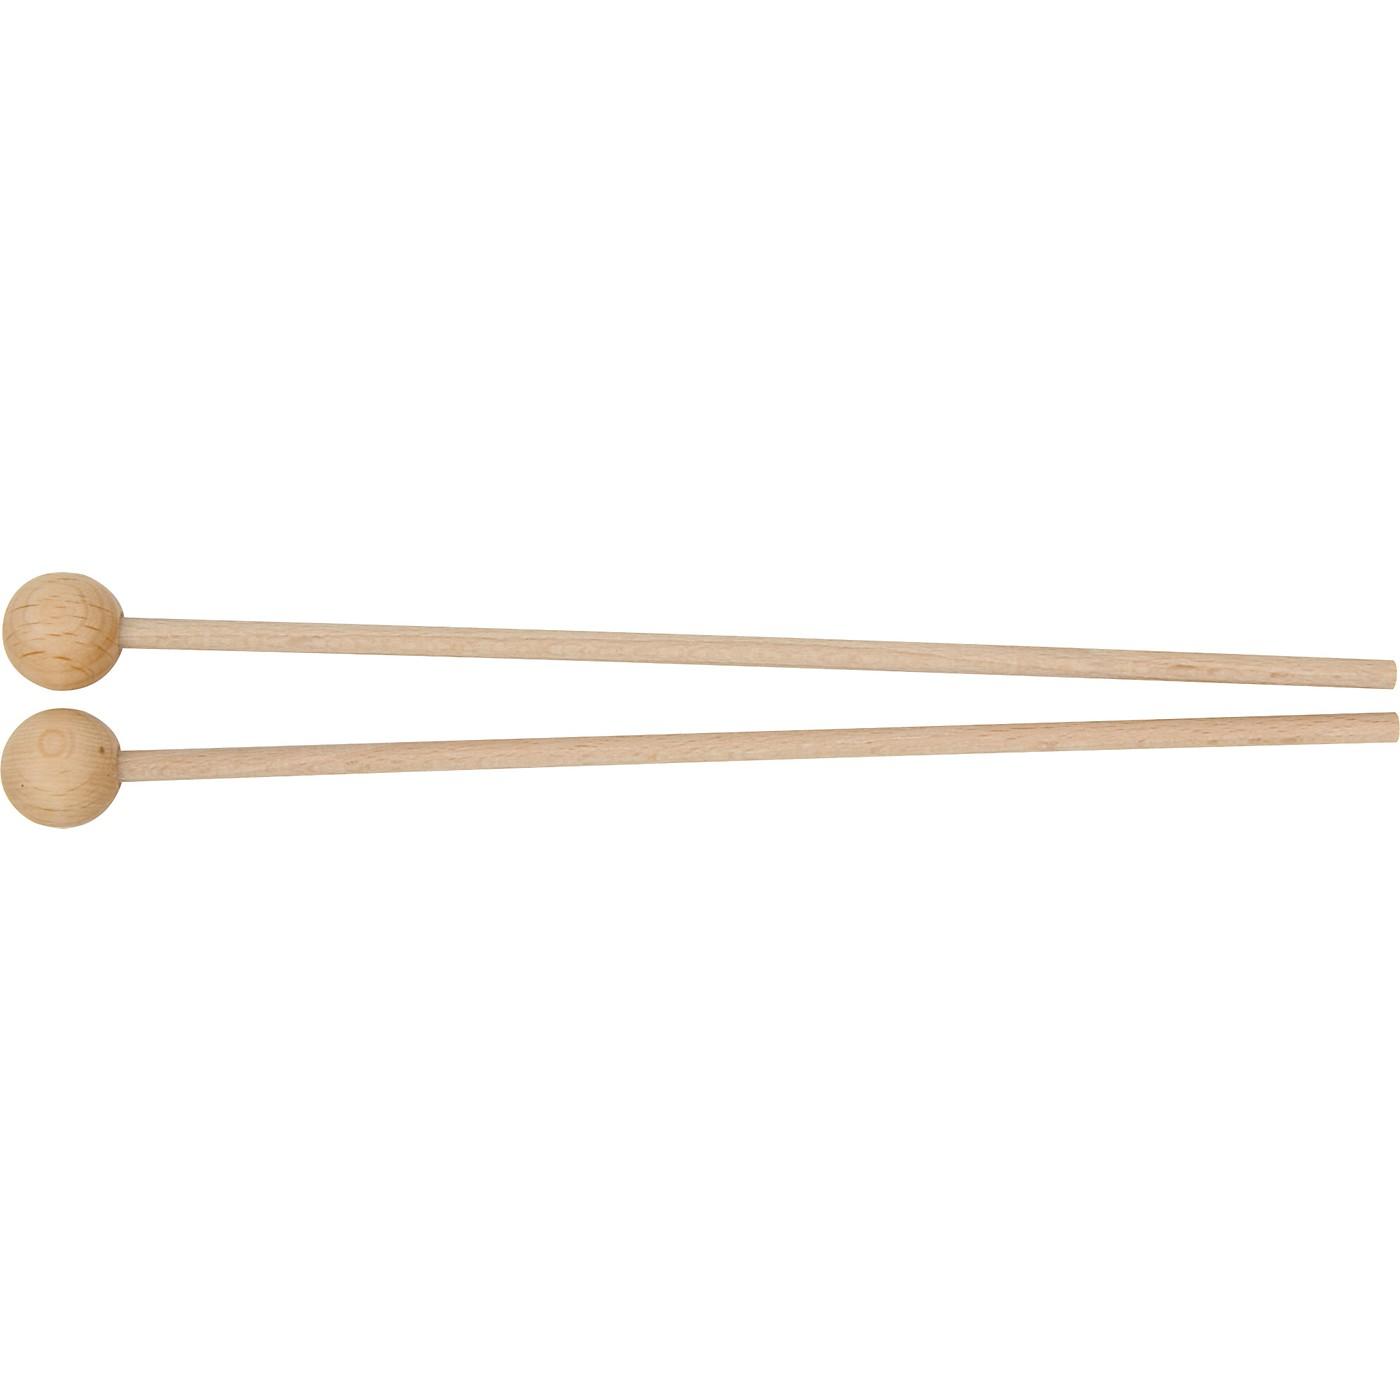 Sonor Orff Hardwood Glockenspiel Mallets thumbnail